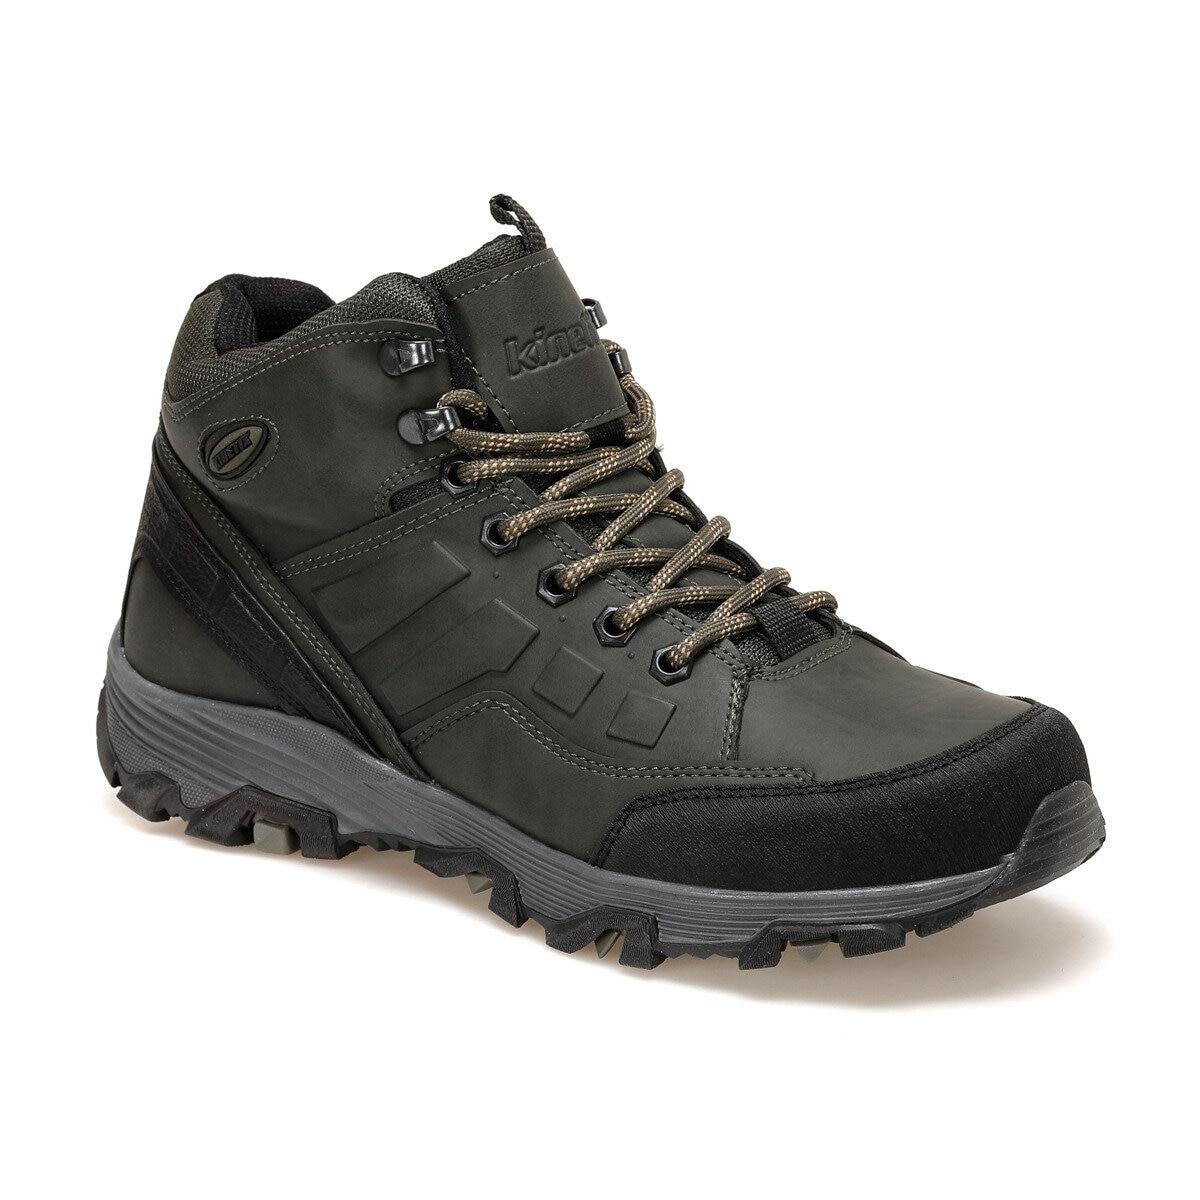 FLO ROGER 9PR Khaki Male Boots KINETIX